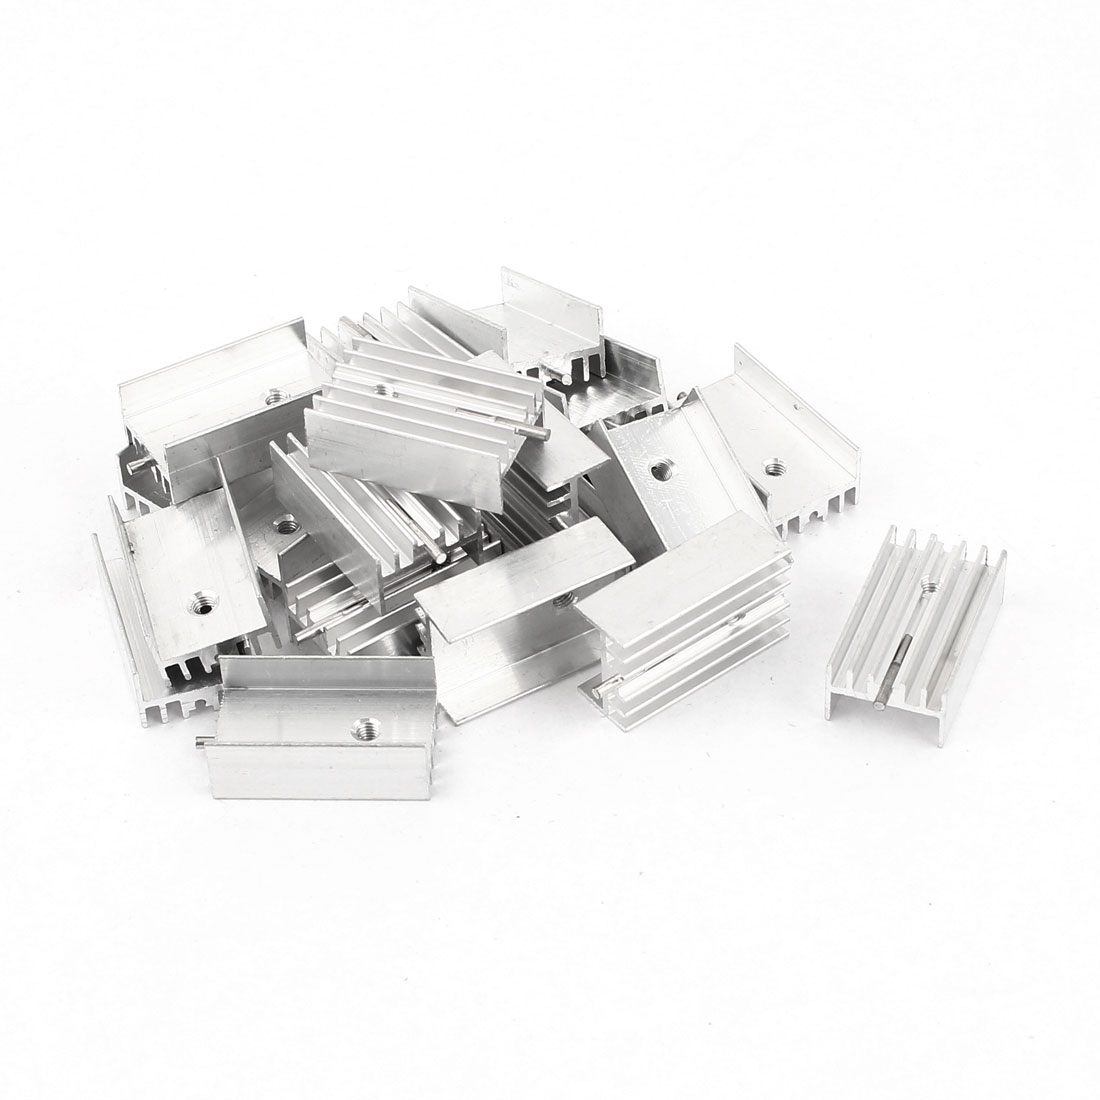 20 Pcs 25x15x10mm Silver Tone Aluminum Heatsinks Radiator + Needle for Mosfet IC